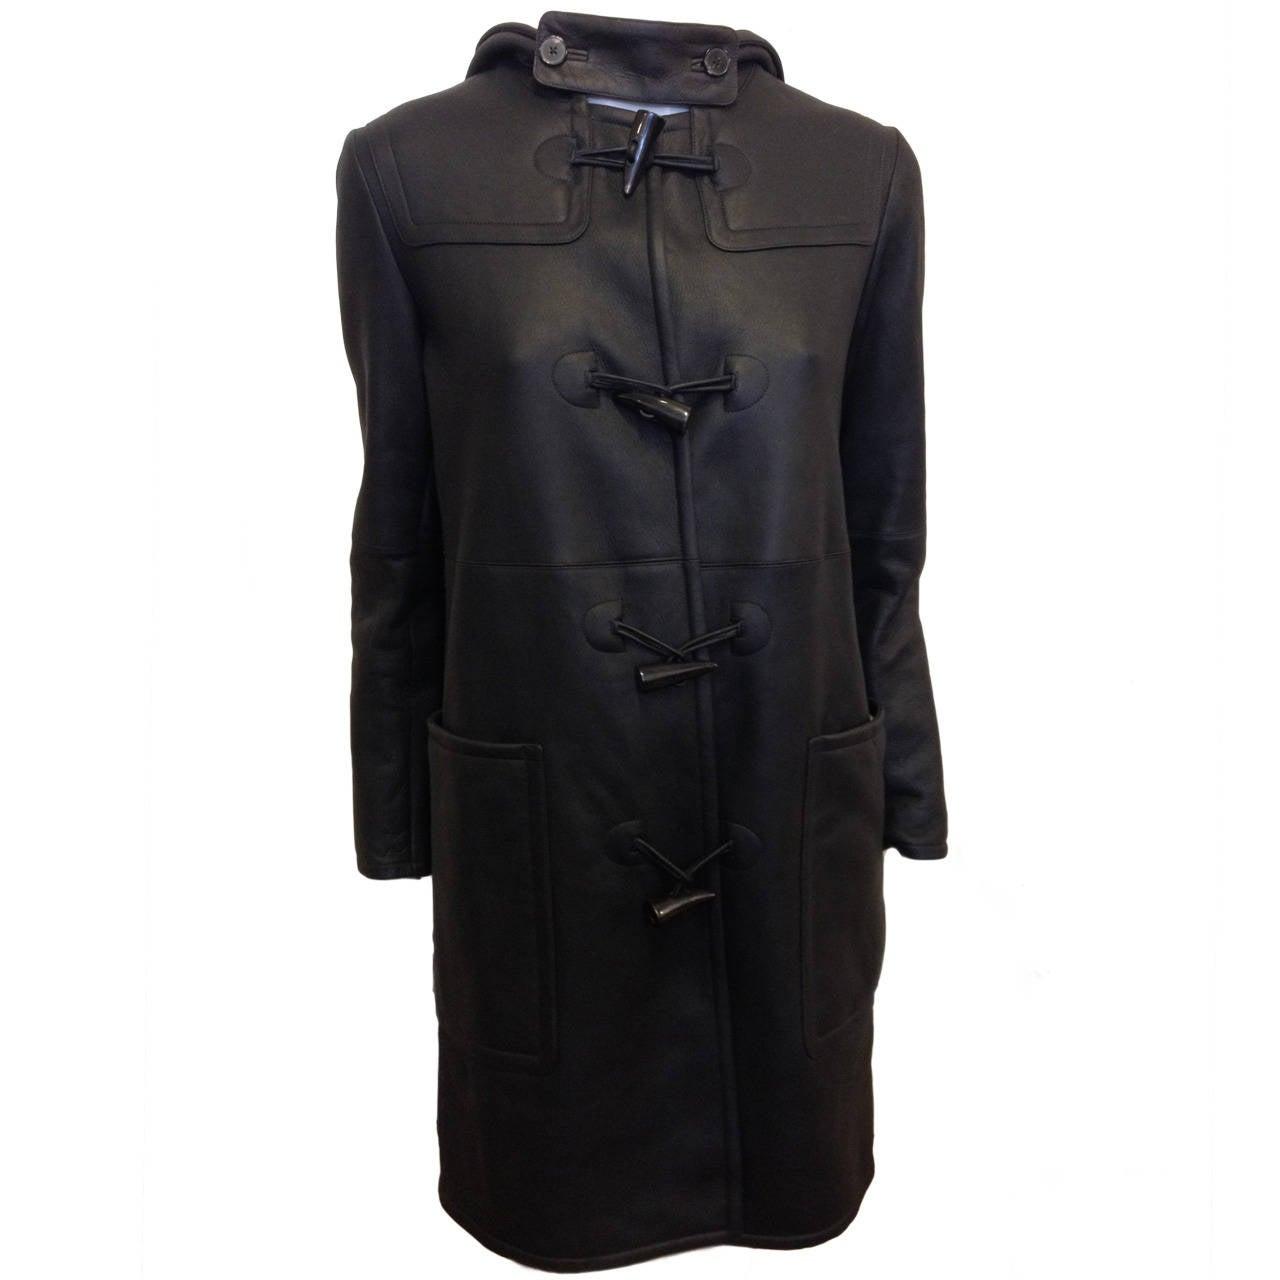 Jil Sander Black Shearling Coat with Hood at 1stdibs